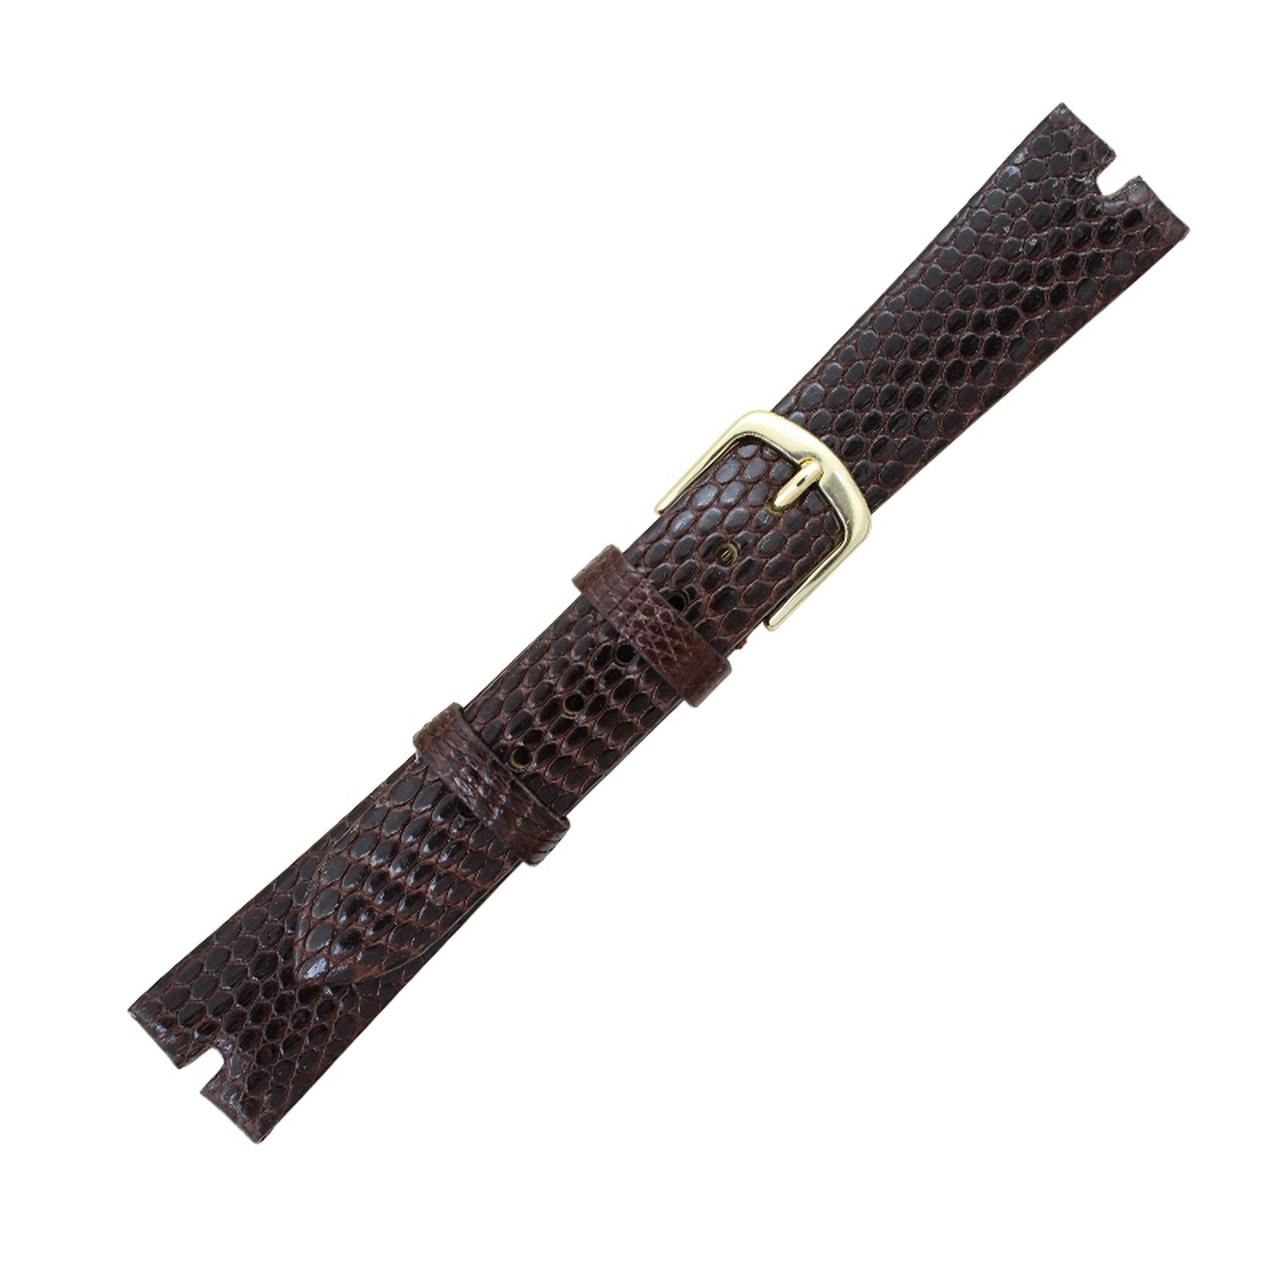 Hadley Roma Genuine Java Lizard Brown Watch Band, Gucci® Style